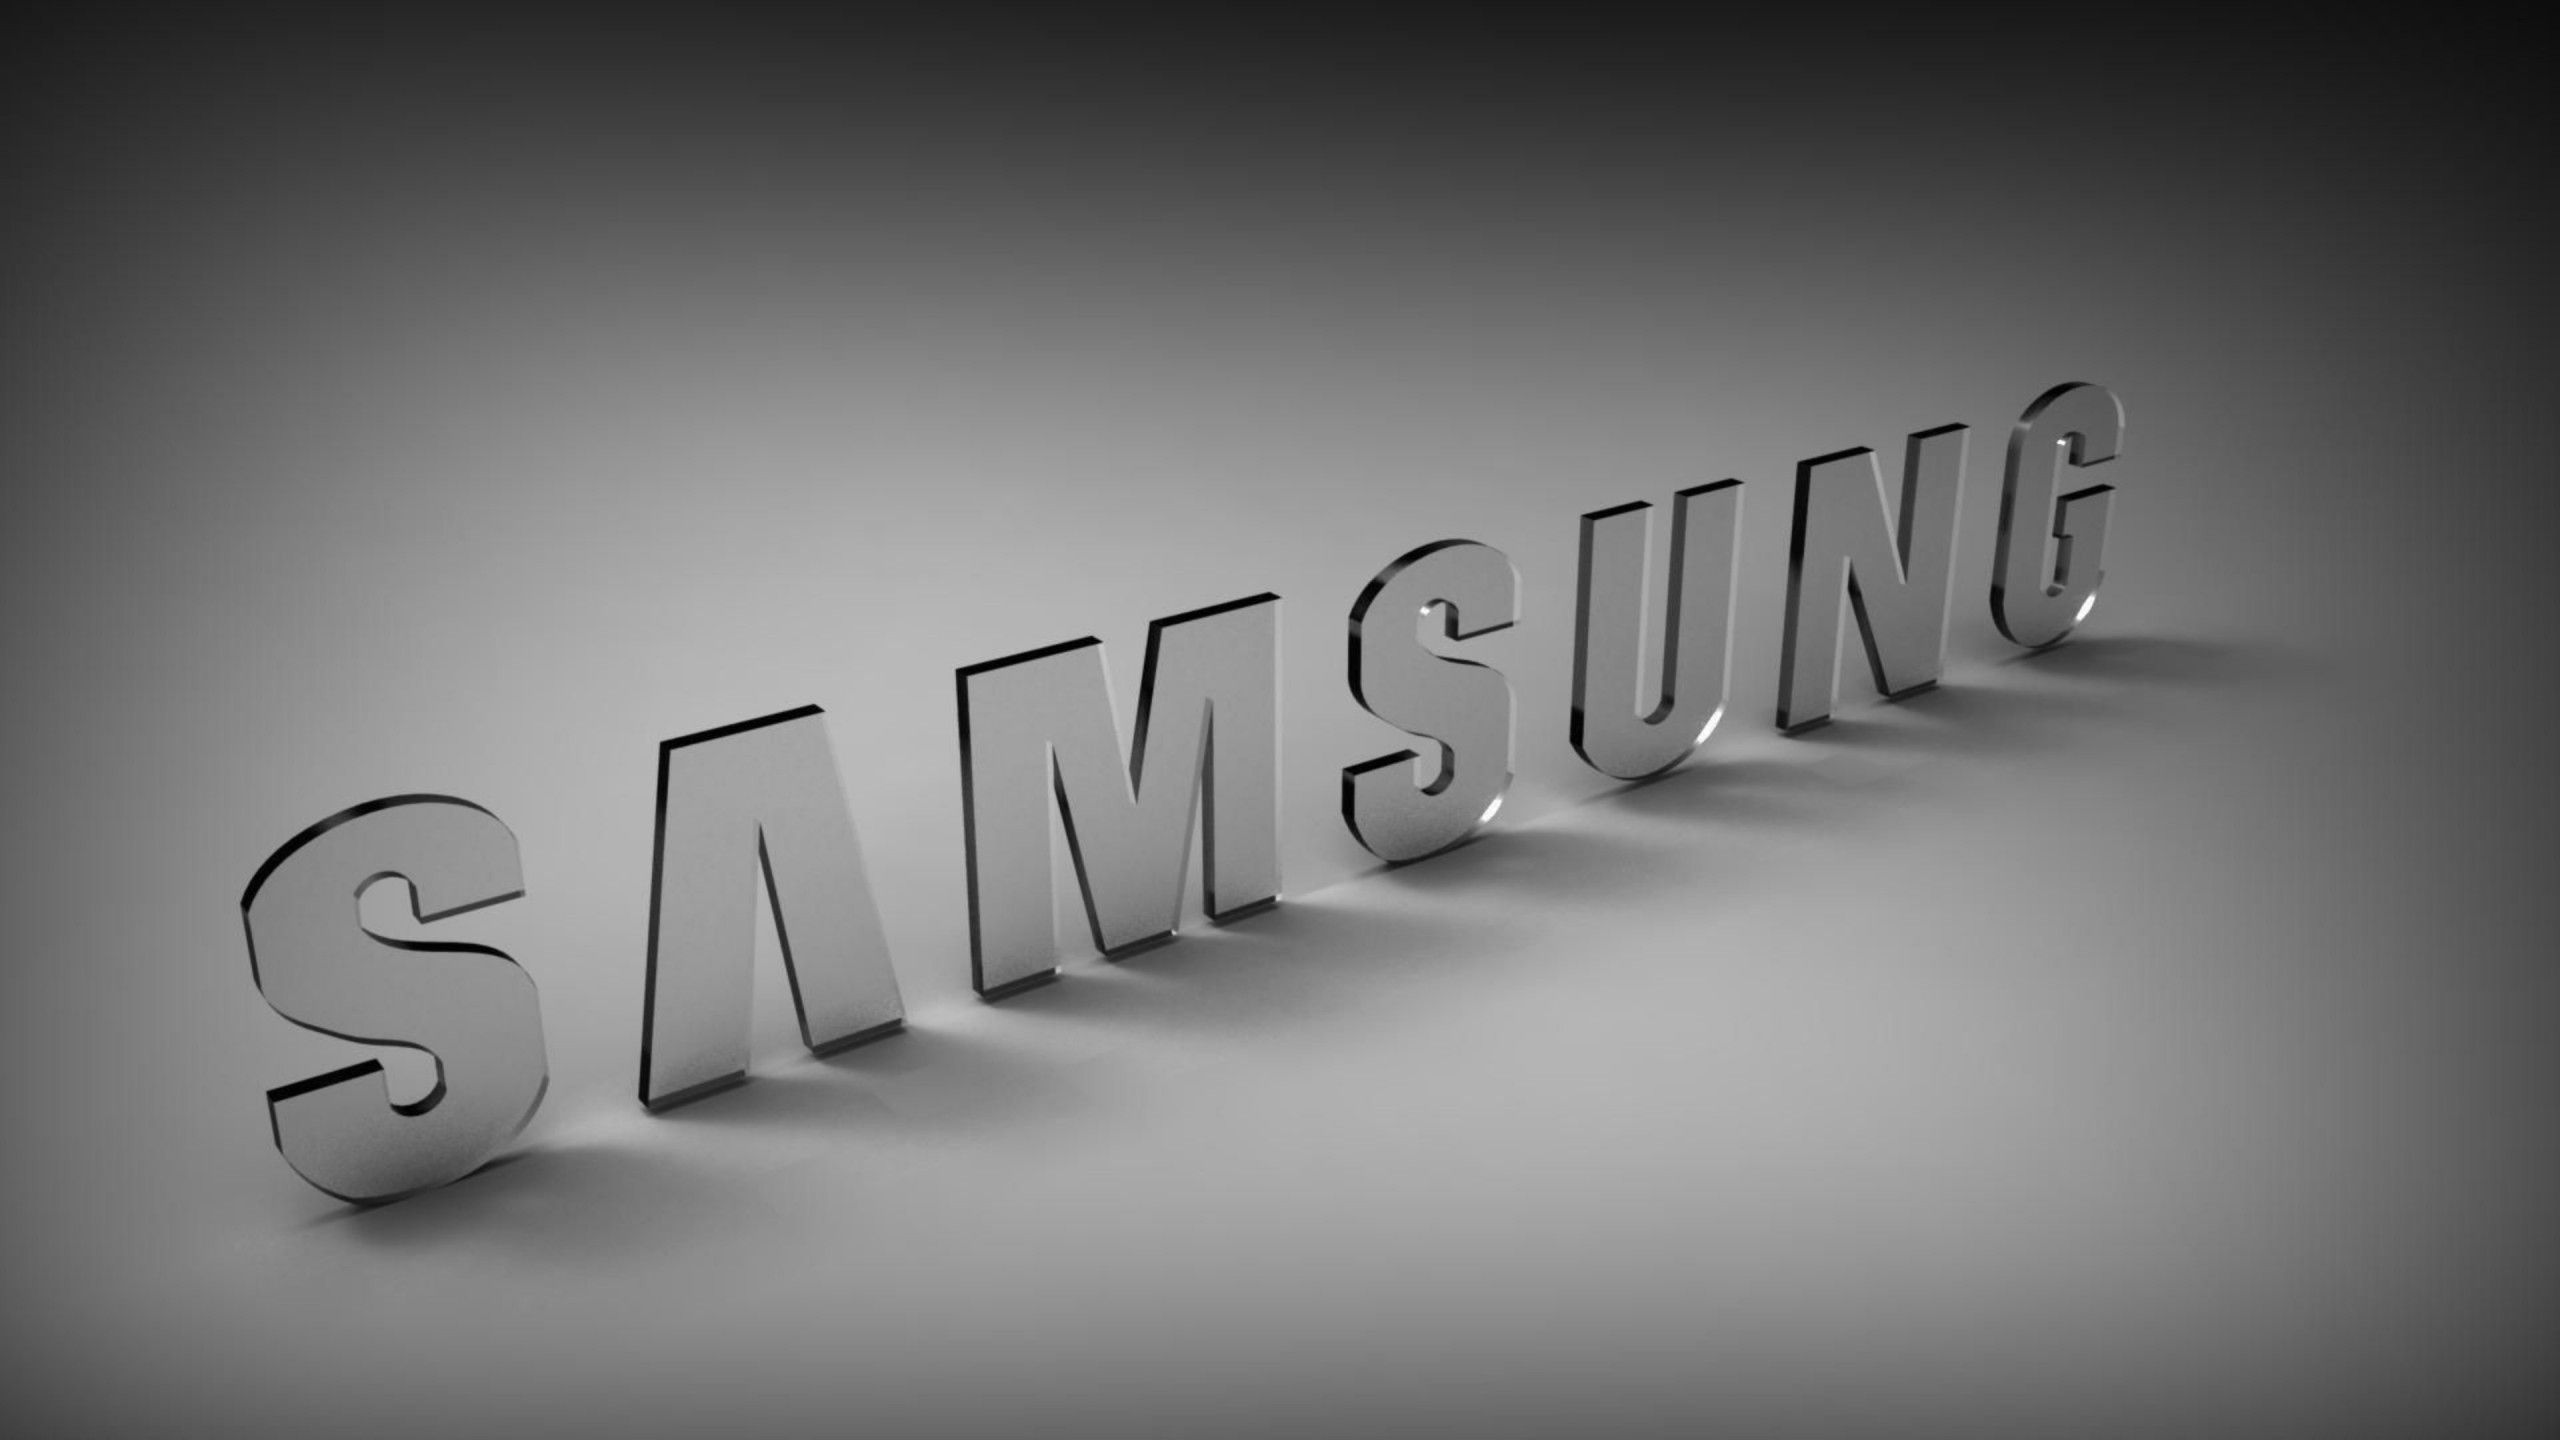 Samsung 4k Black Wallpapers Top Free Samsung 4k Black Backgrounds Wallpaperaccess